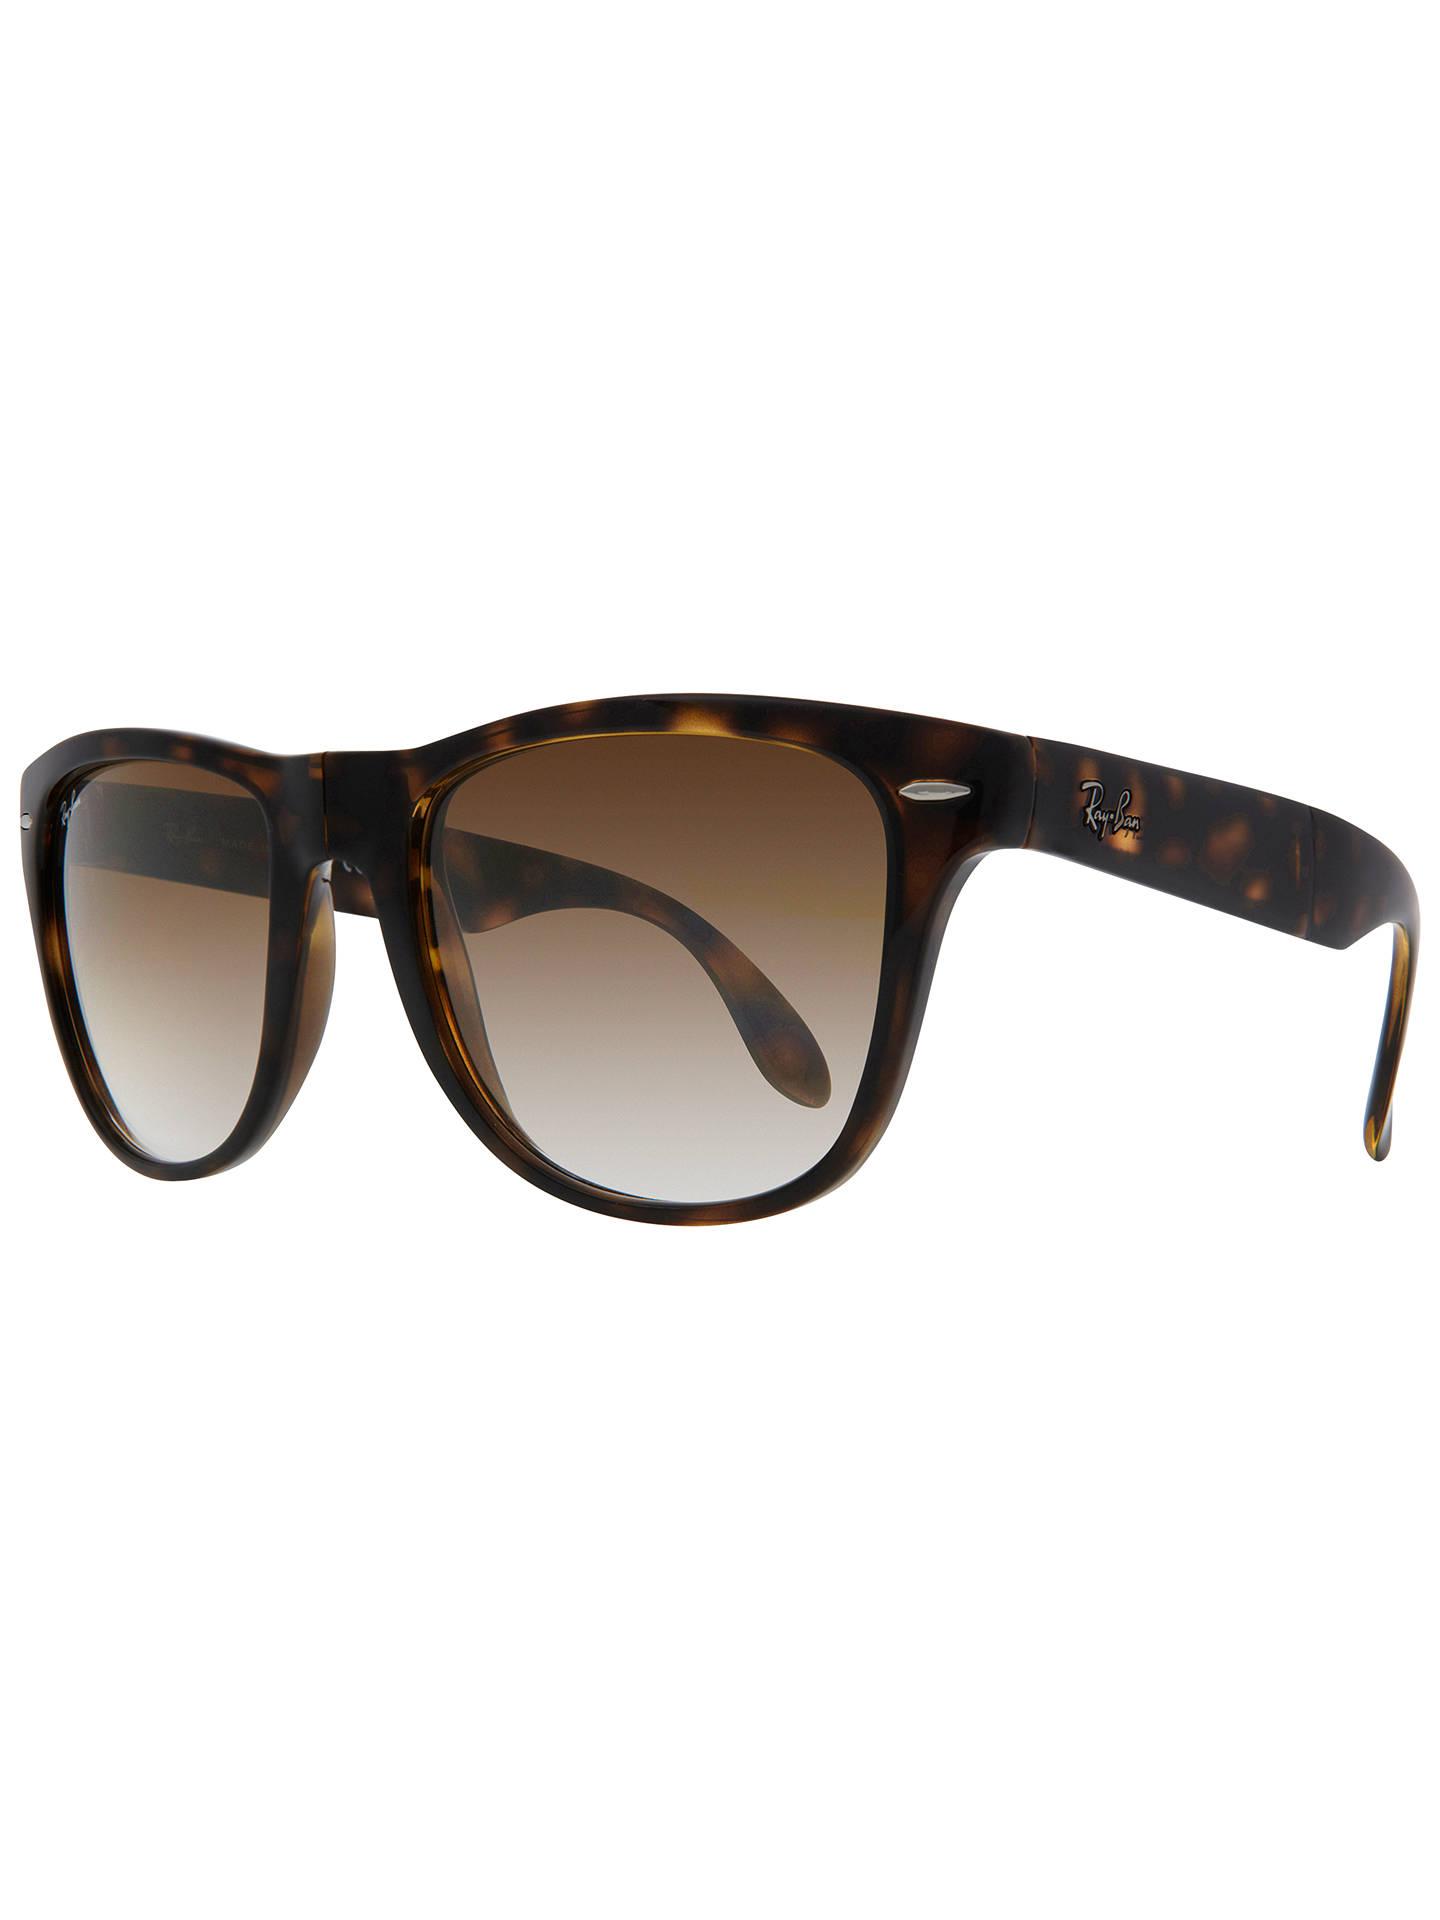 e0477ffaf9c14 Buy Ray-Ban RB4105 Wayfarer Folding Sunglasses